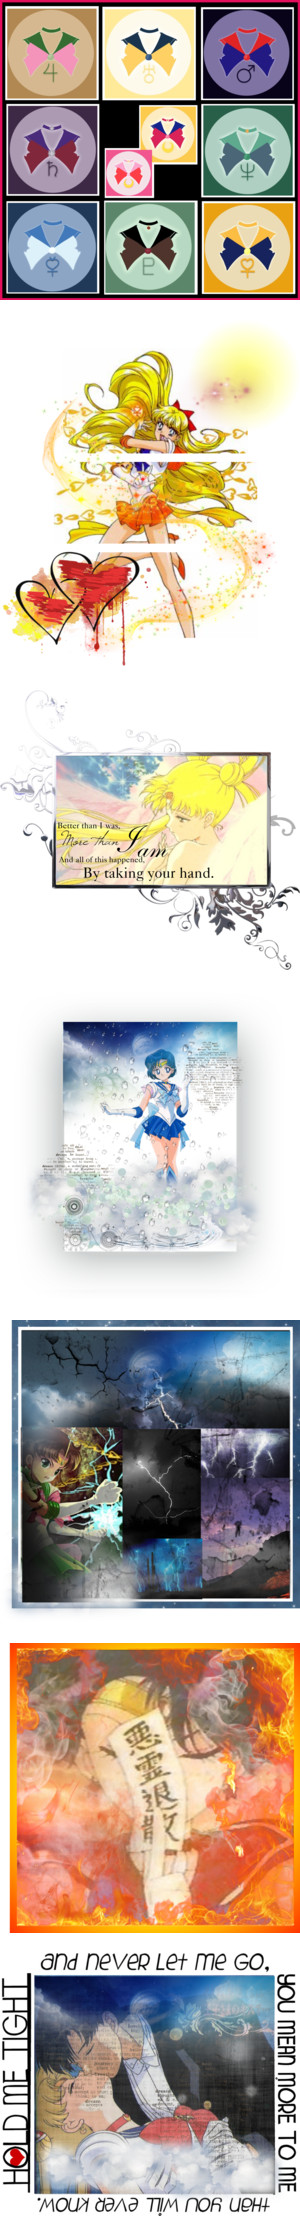 """Sailor Moon. Yup"" by princessluna22 ❤ liked on Polyvore"